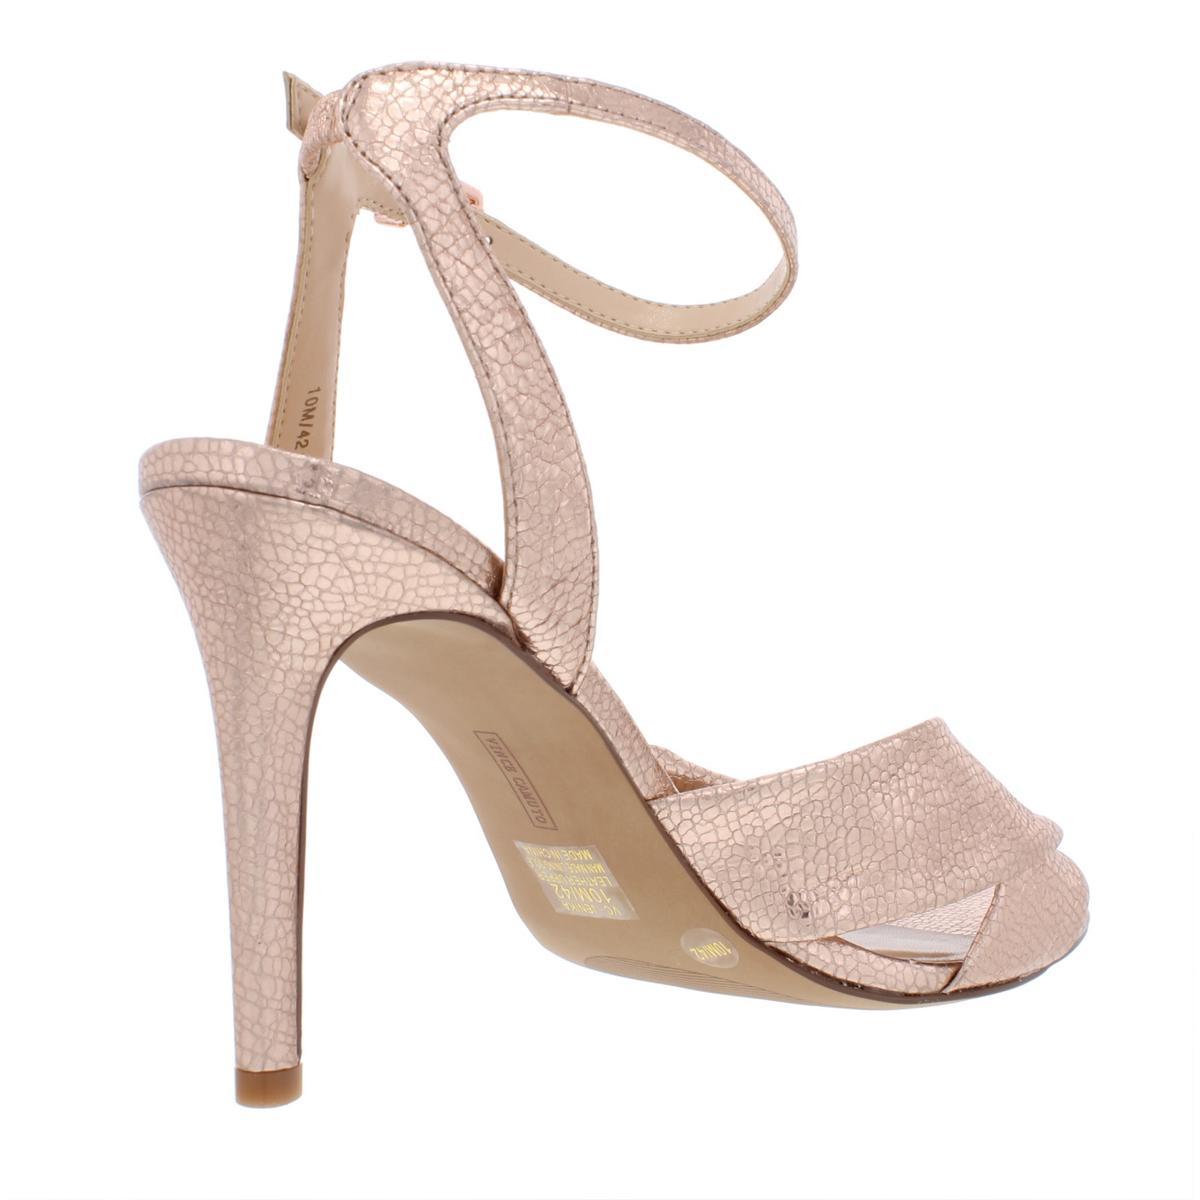 Vince-Camuto-Womens-Jenika-Nubuck-Stiletto-Night-Out-Heels-Shoes-BHFO-6694 thumbnail 4